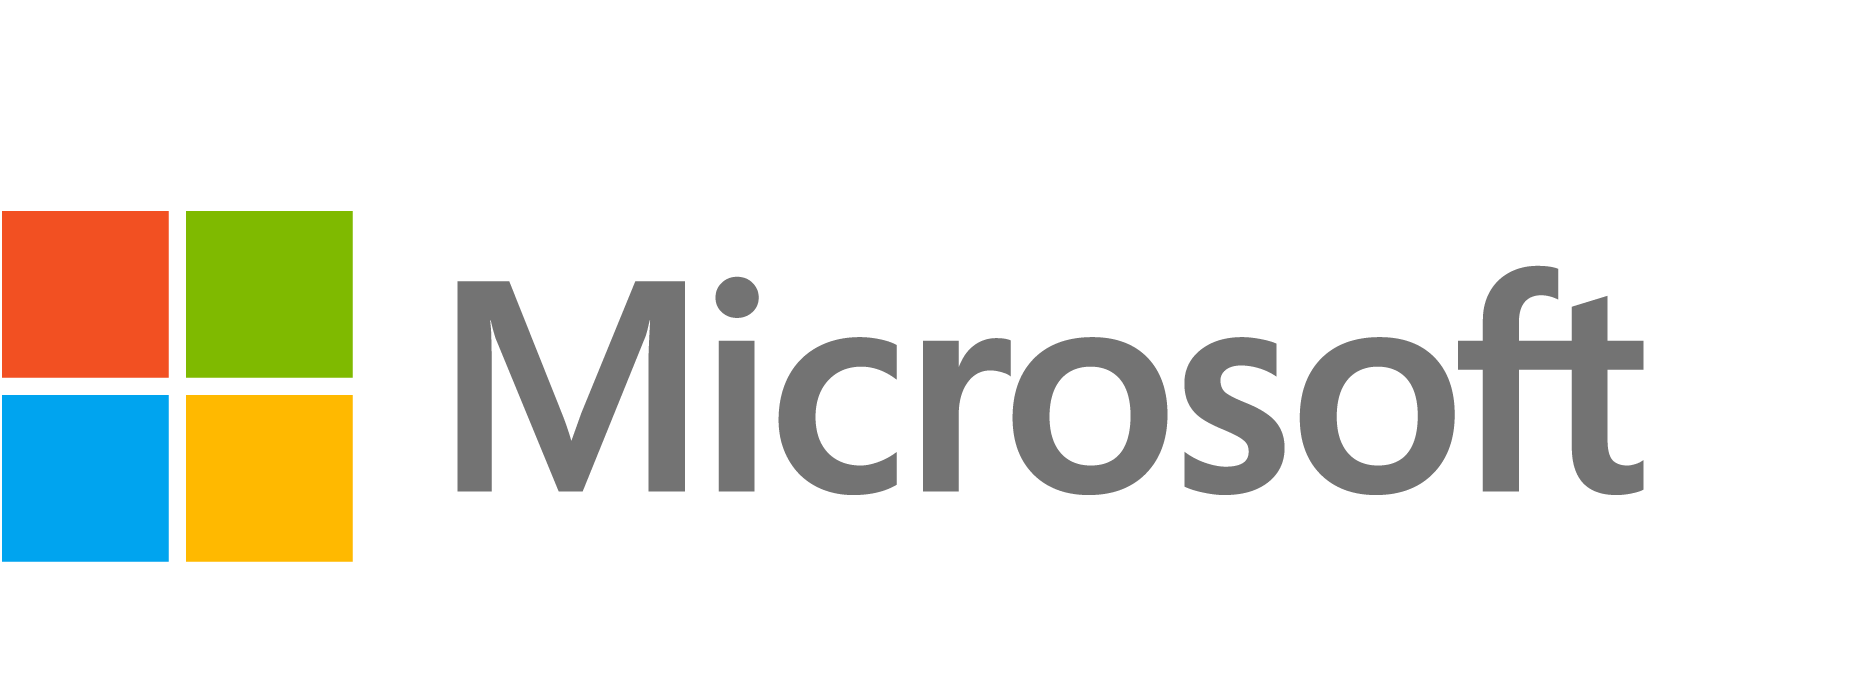 Microsoft logo - Onze Partners